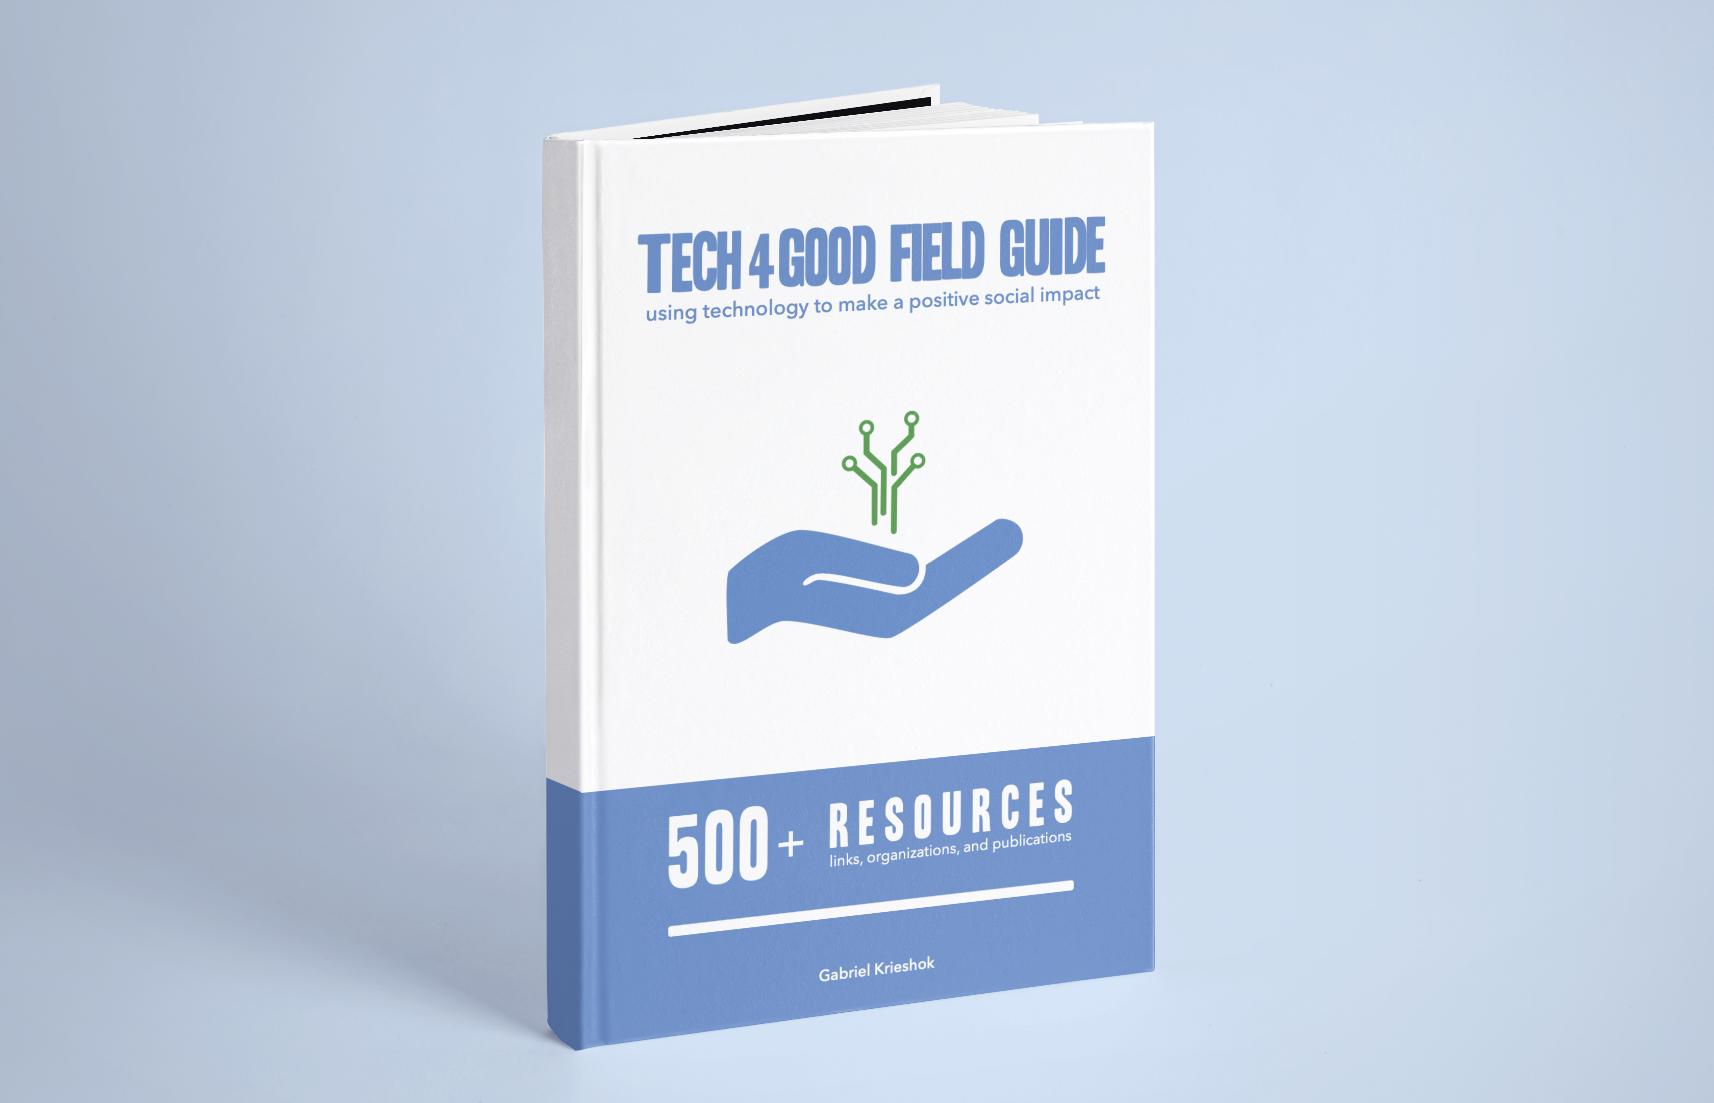 Tech4Good Field Guide